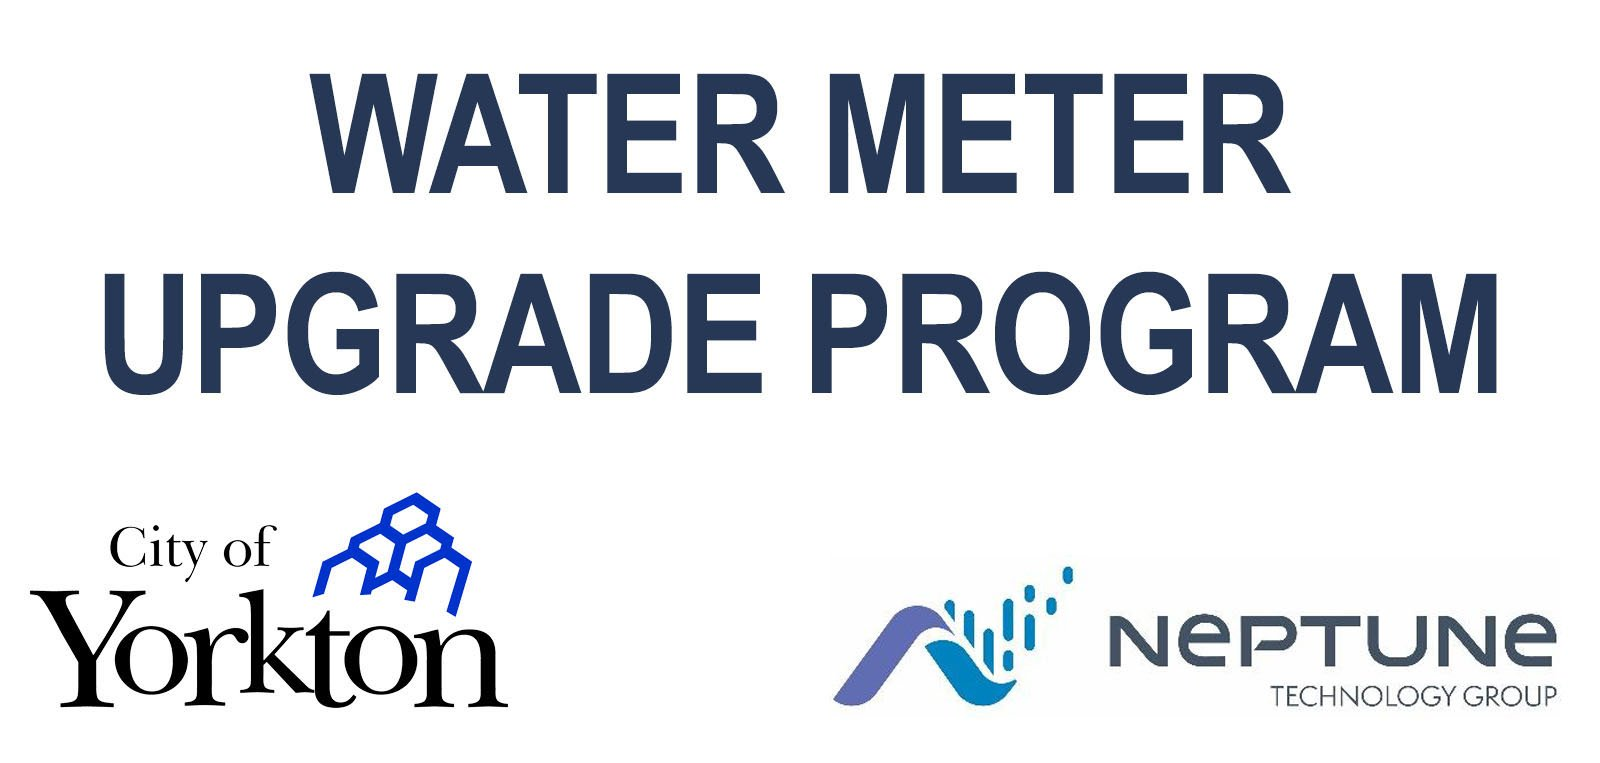 water meter upgrade city and contractor logos